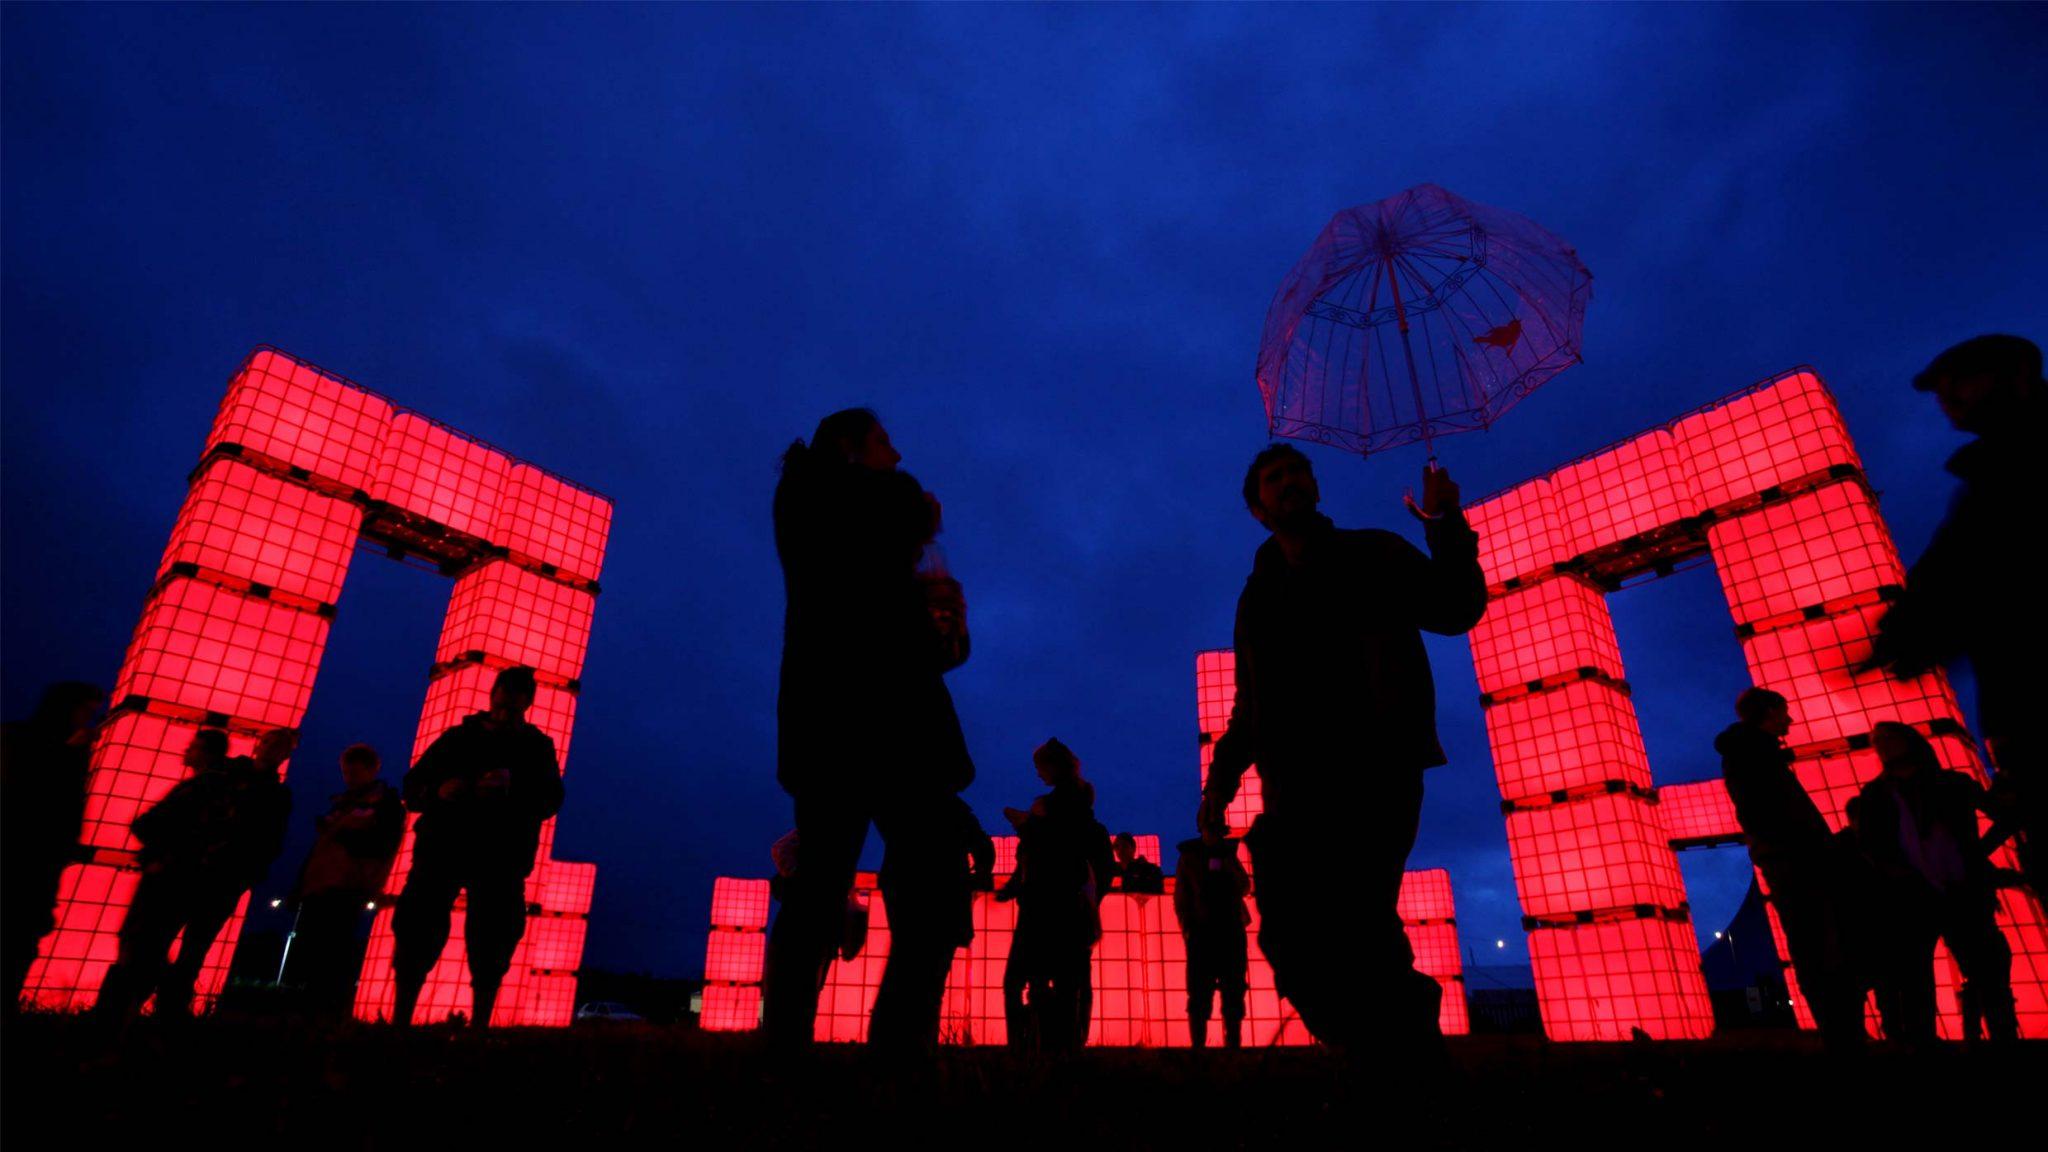 Cubes 'Cubehenge' @ Glastonbury Festival, Pilton, Somerset